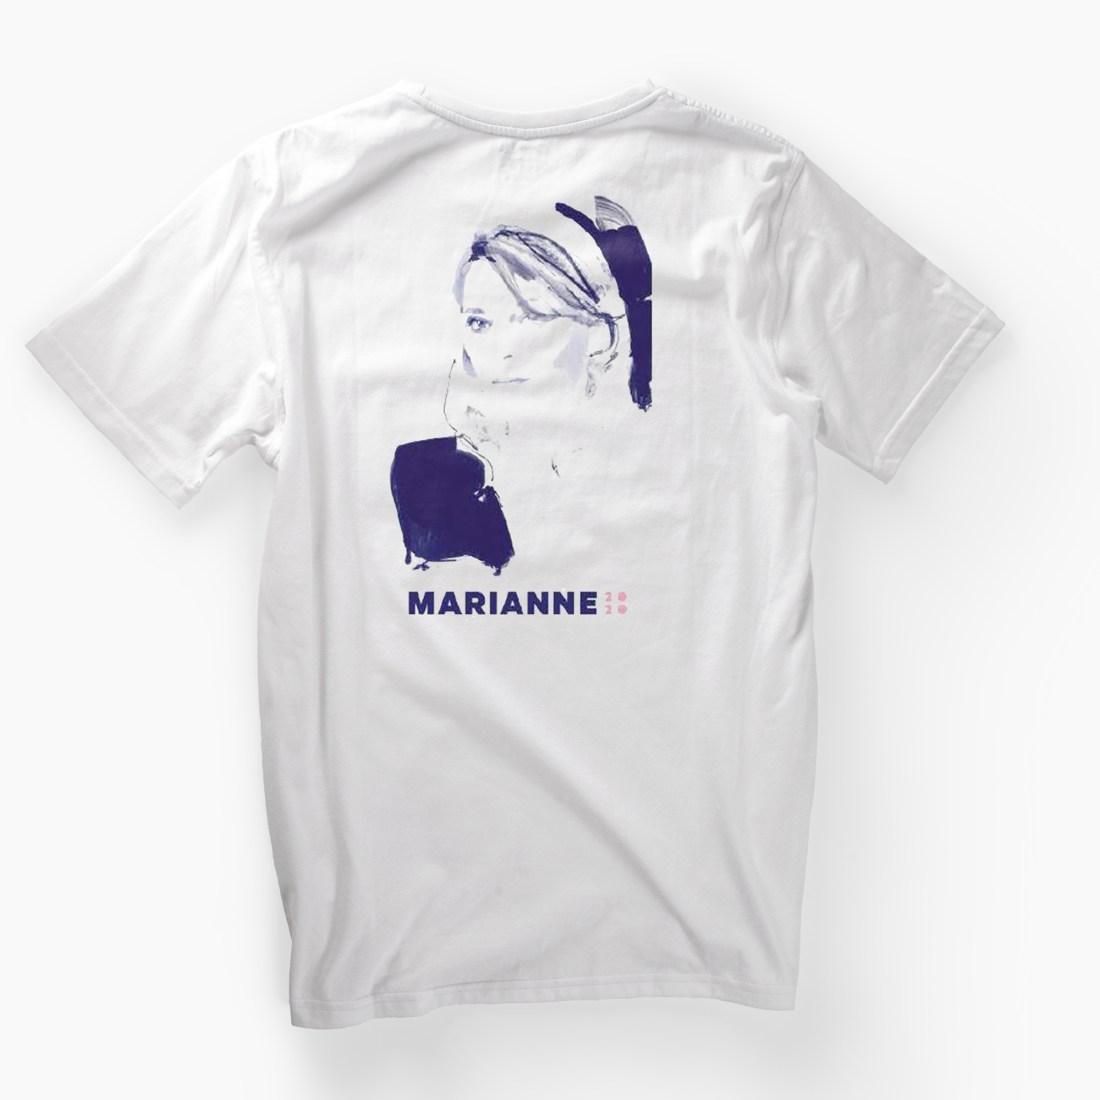 Marianne Williamson T-Shirt by David Downton (marianne2020.com)